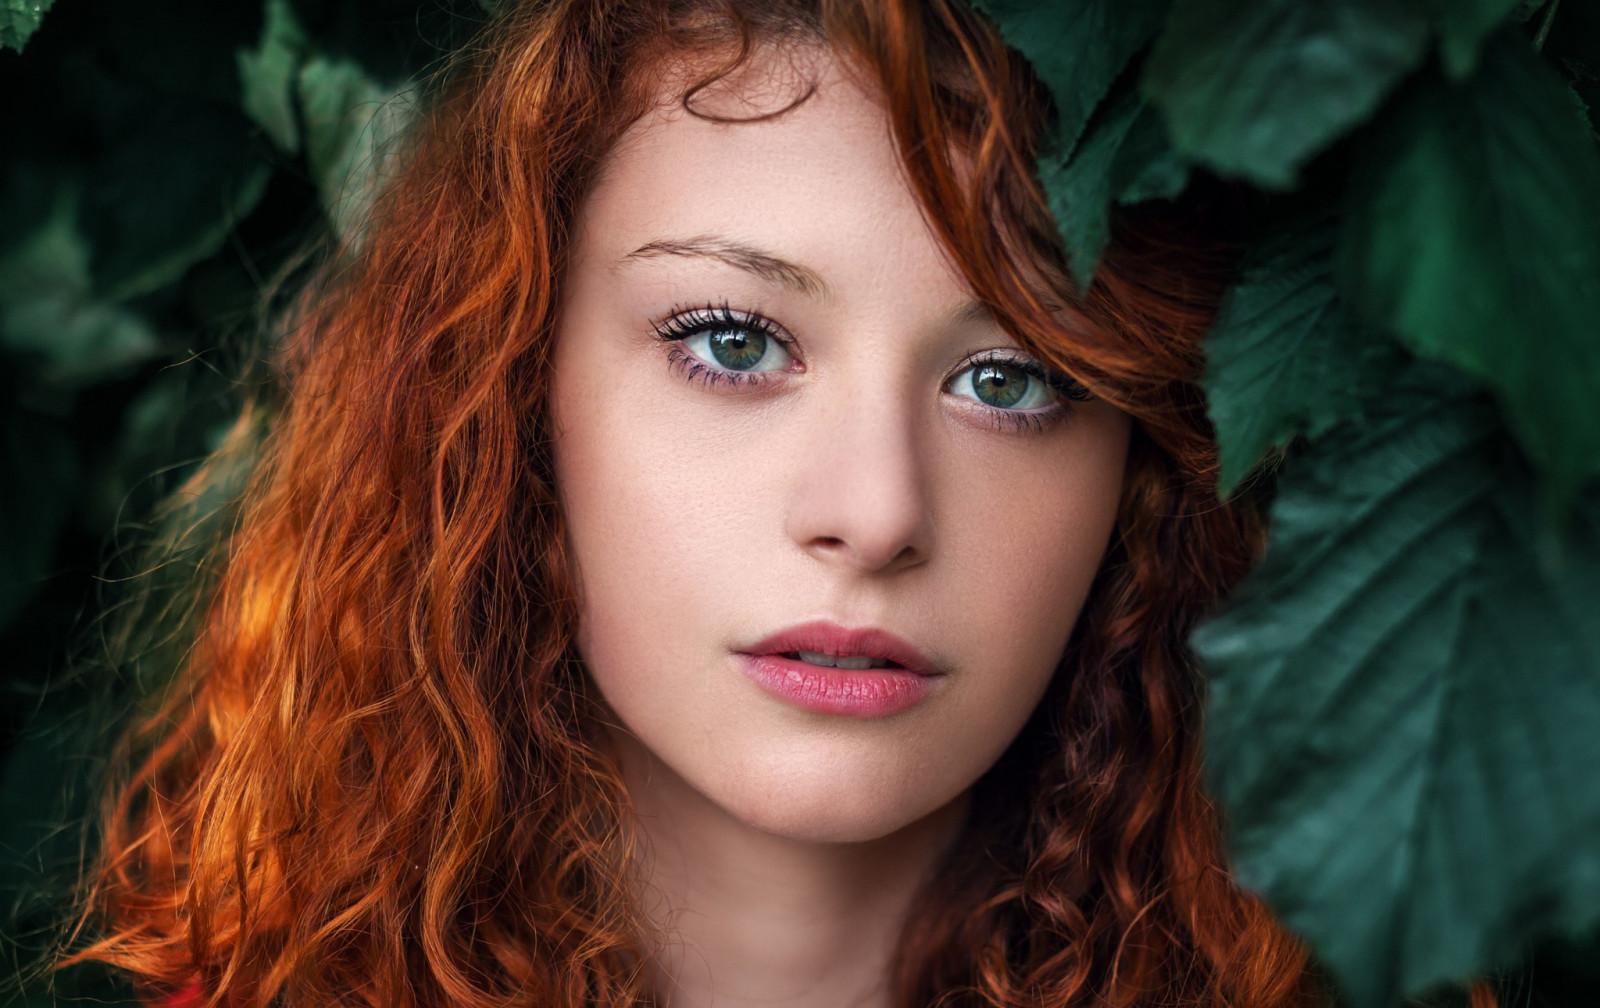 Haare Im Gesicht Frau